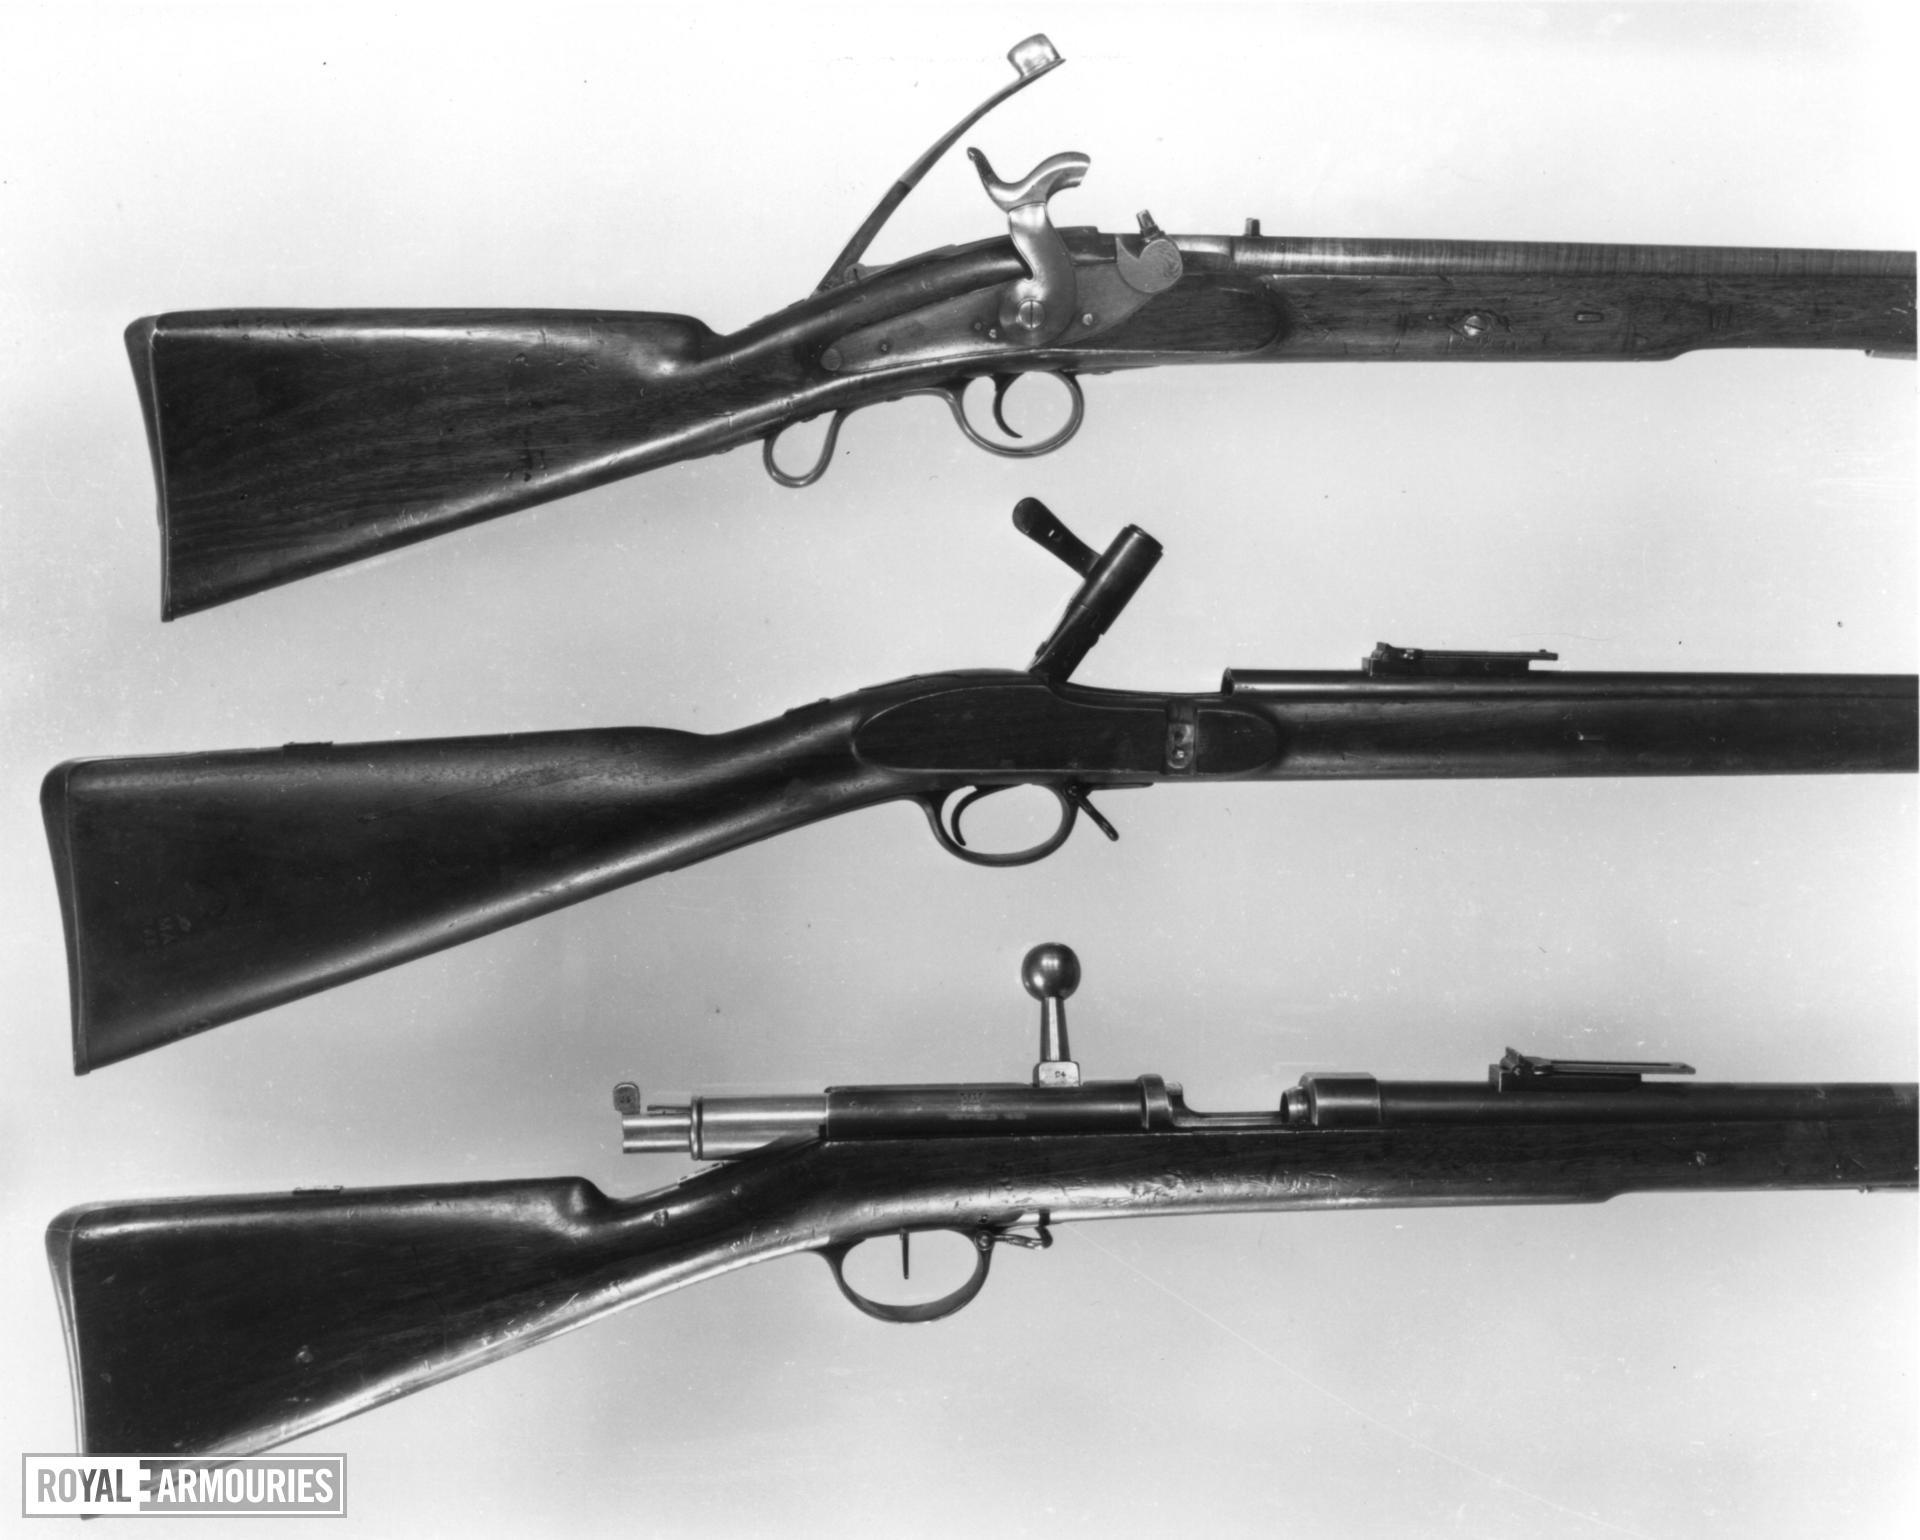 Percussion breech-loading military carbine - Jenks Patent